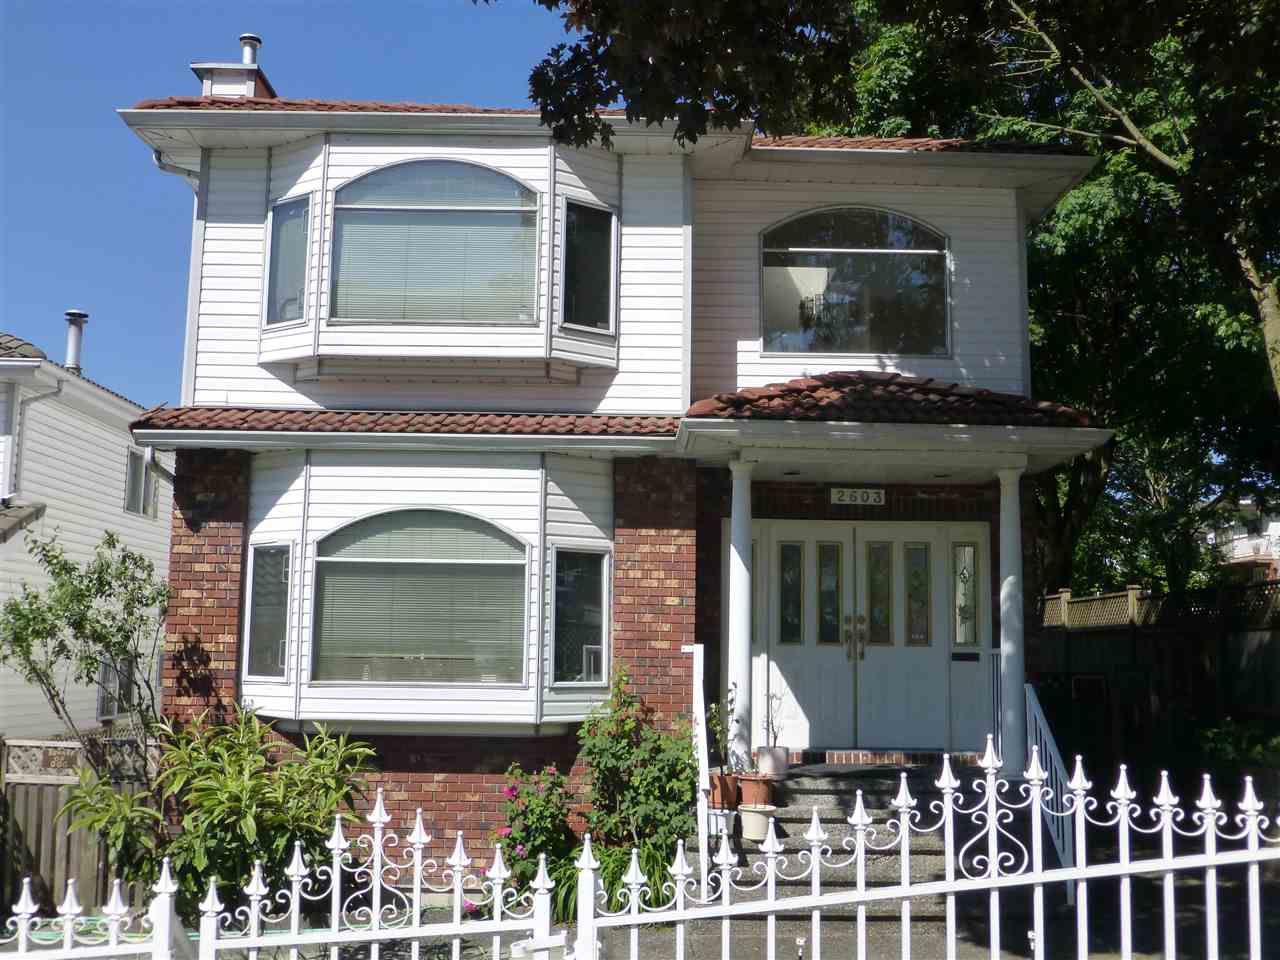 Main Photo: 2603 RENFREW Street in Vancouver: Renfrew VE House for sale (Vancouver East)  : MLS®# R2067585